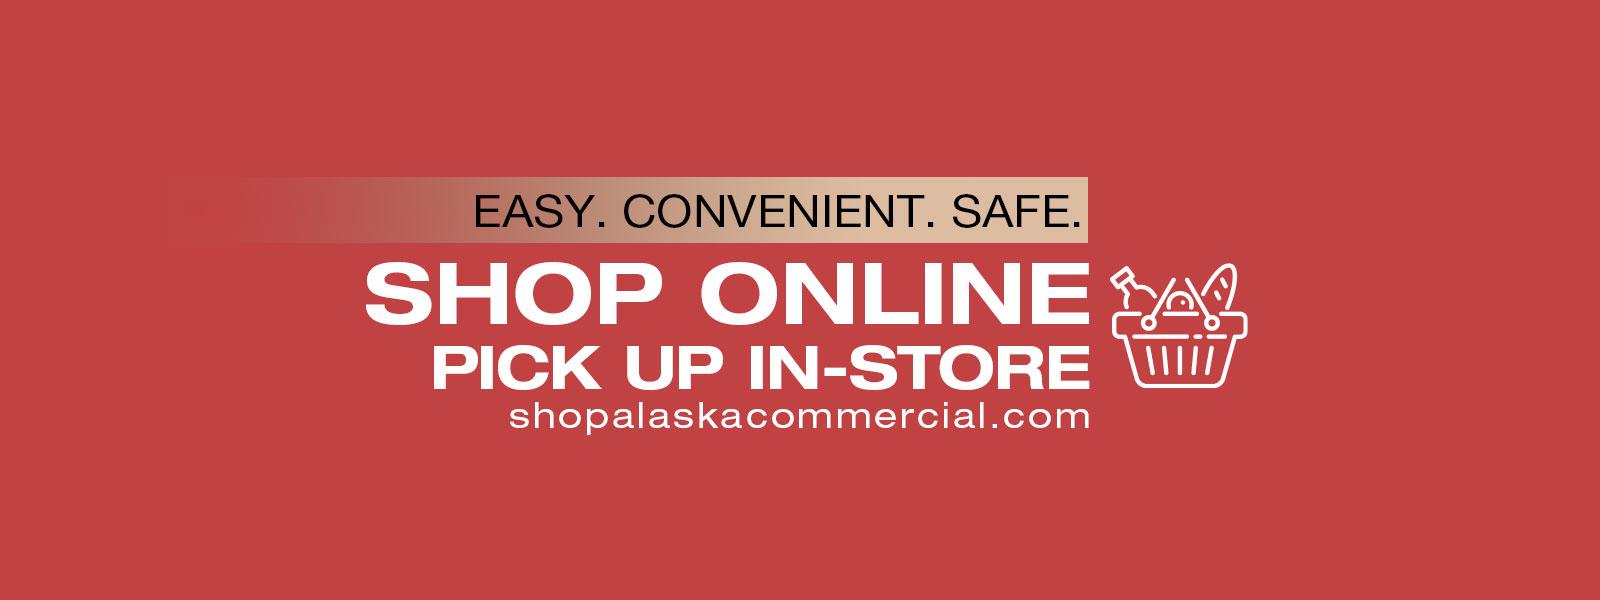 Shop online Shop Alaska Commercial